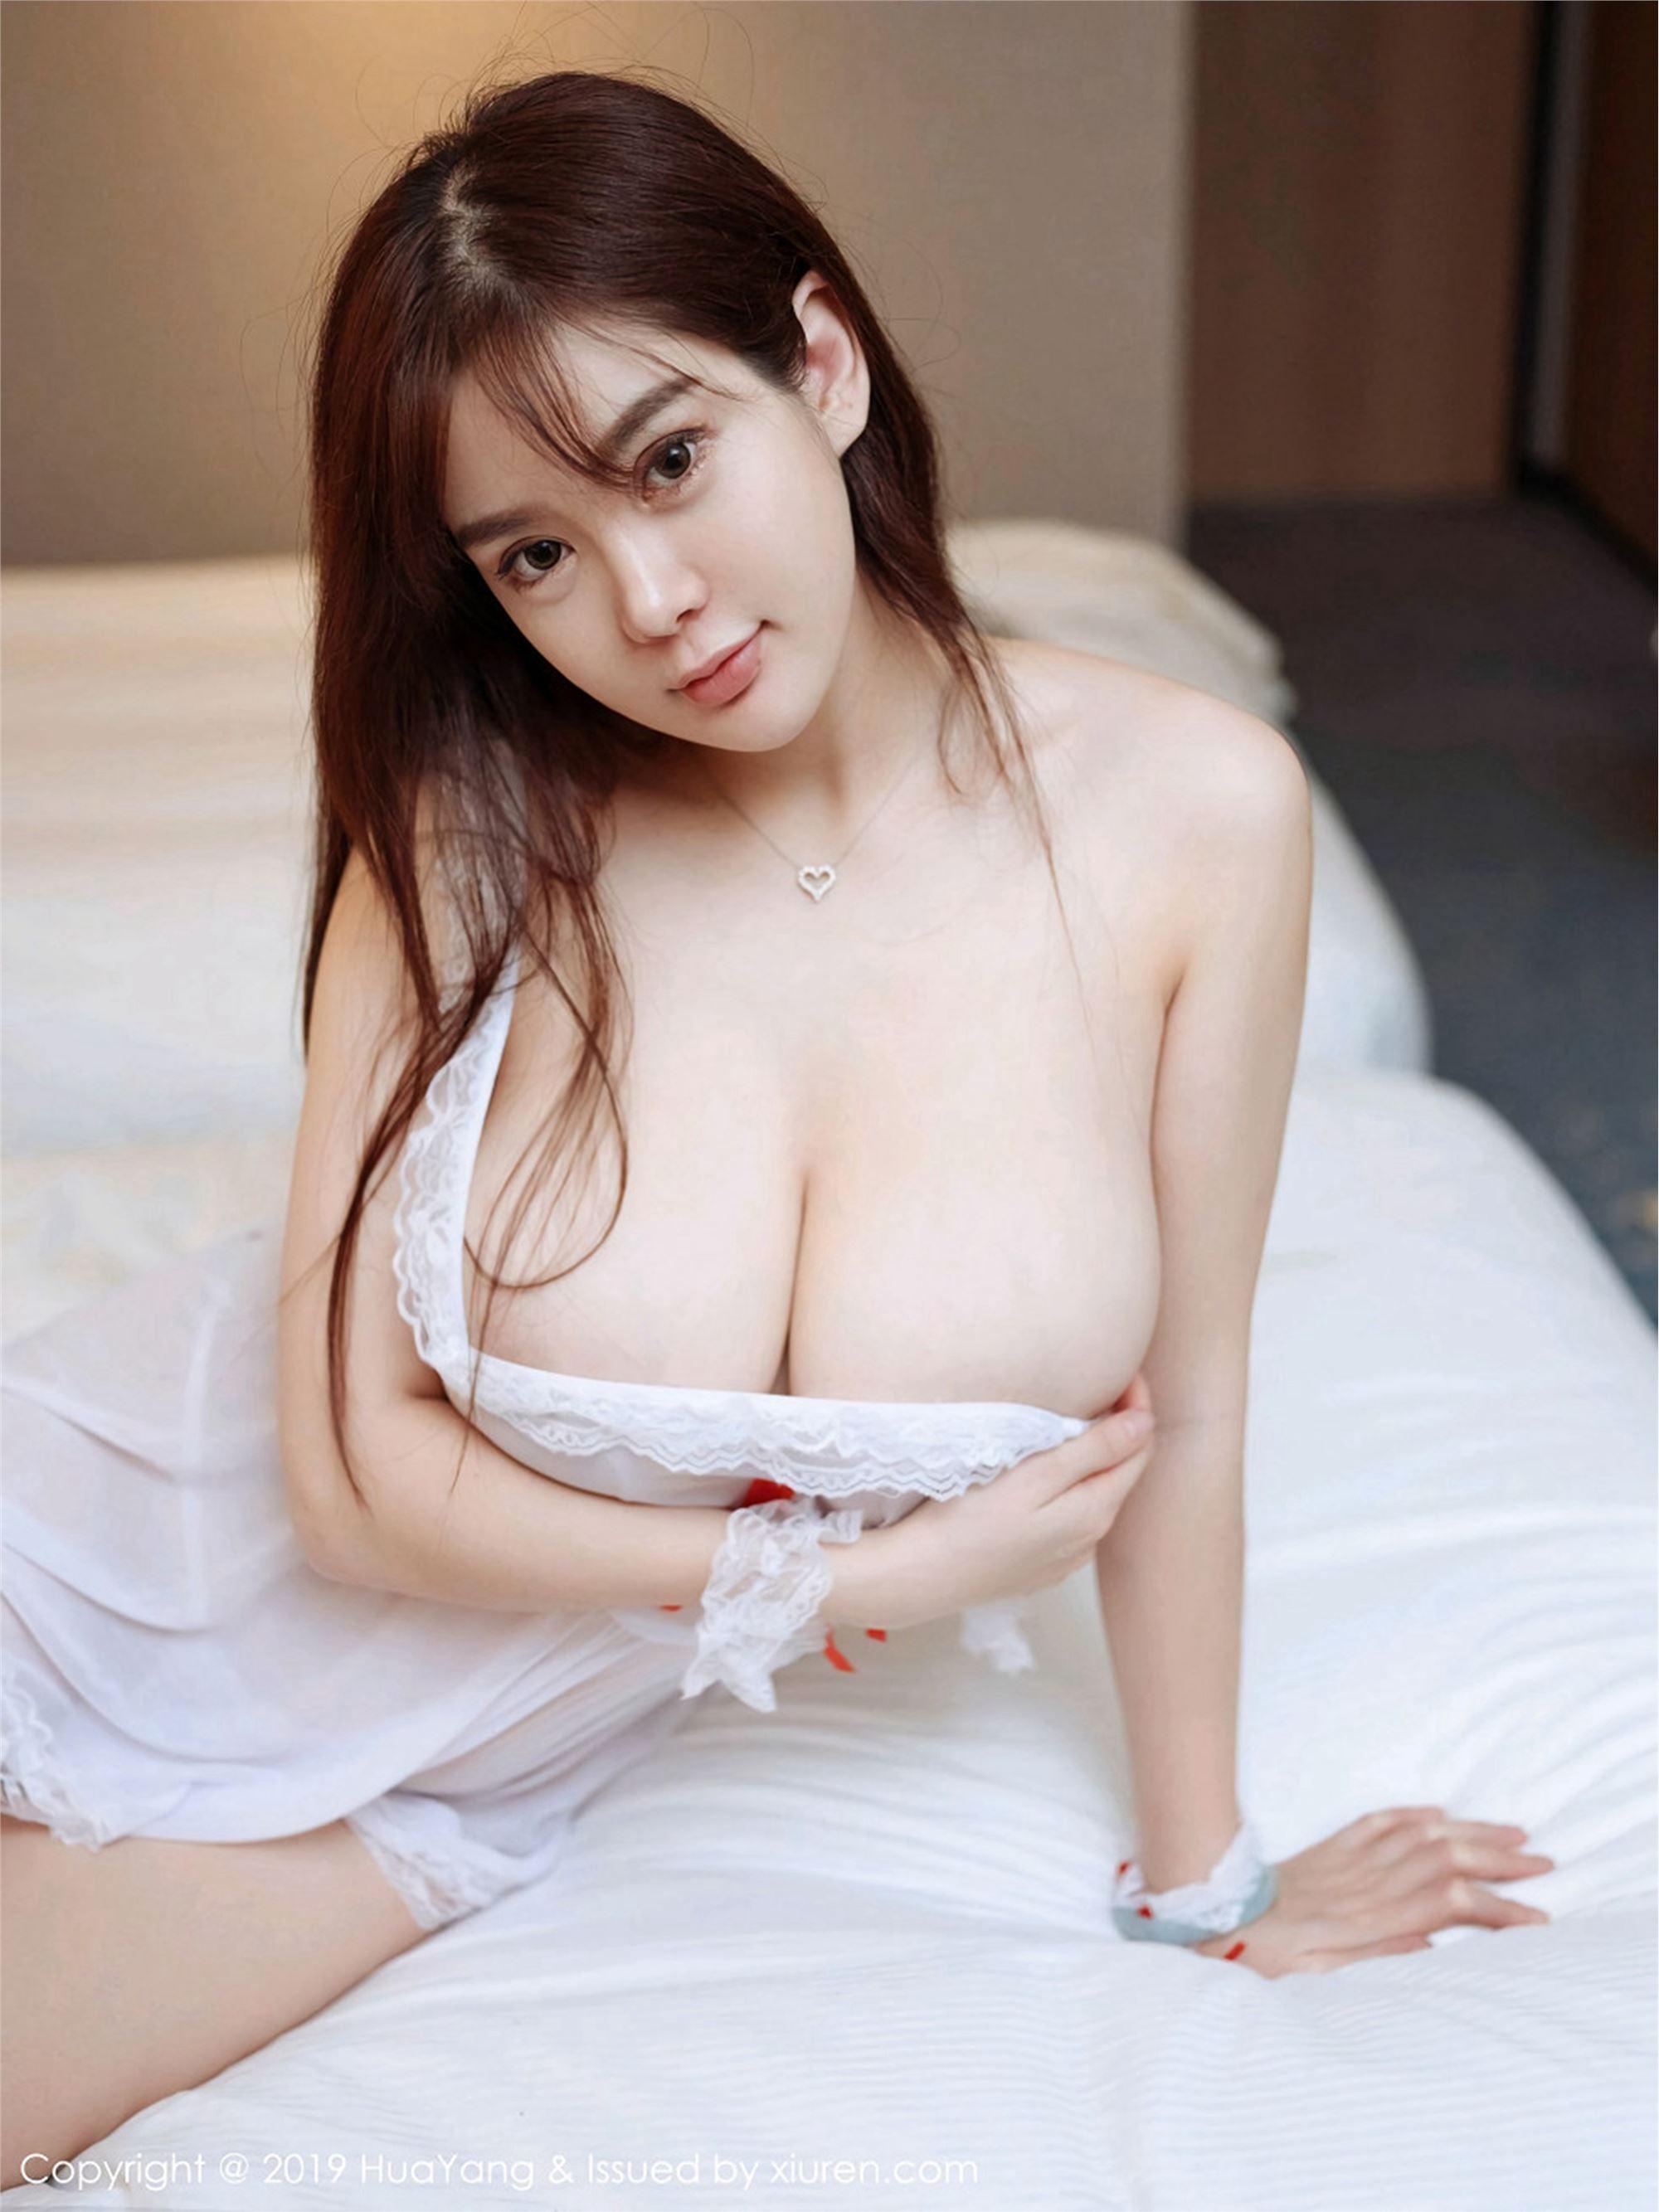 [HuaYang花漾]2019.01.24 Vol.111 易阳Silvia(1)